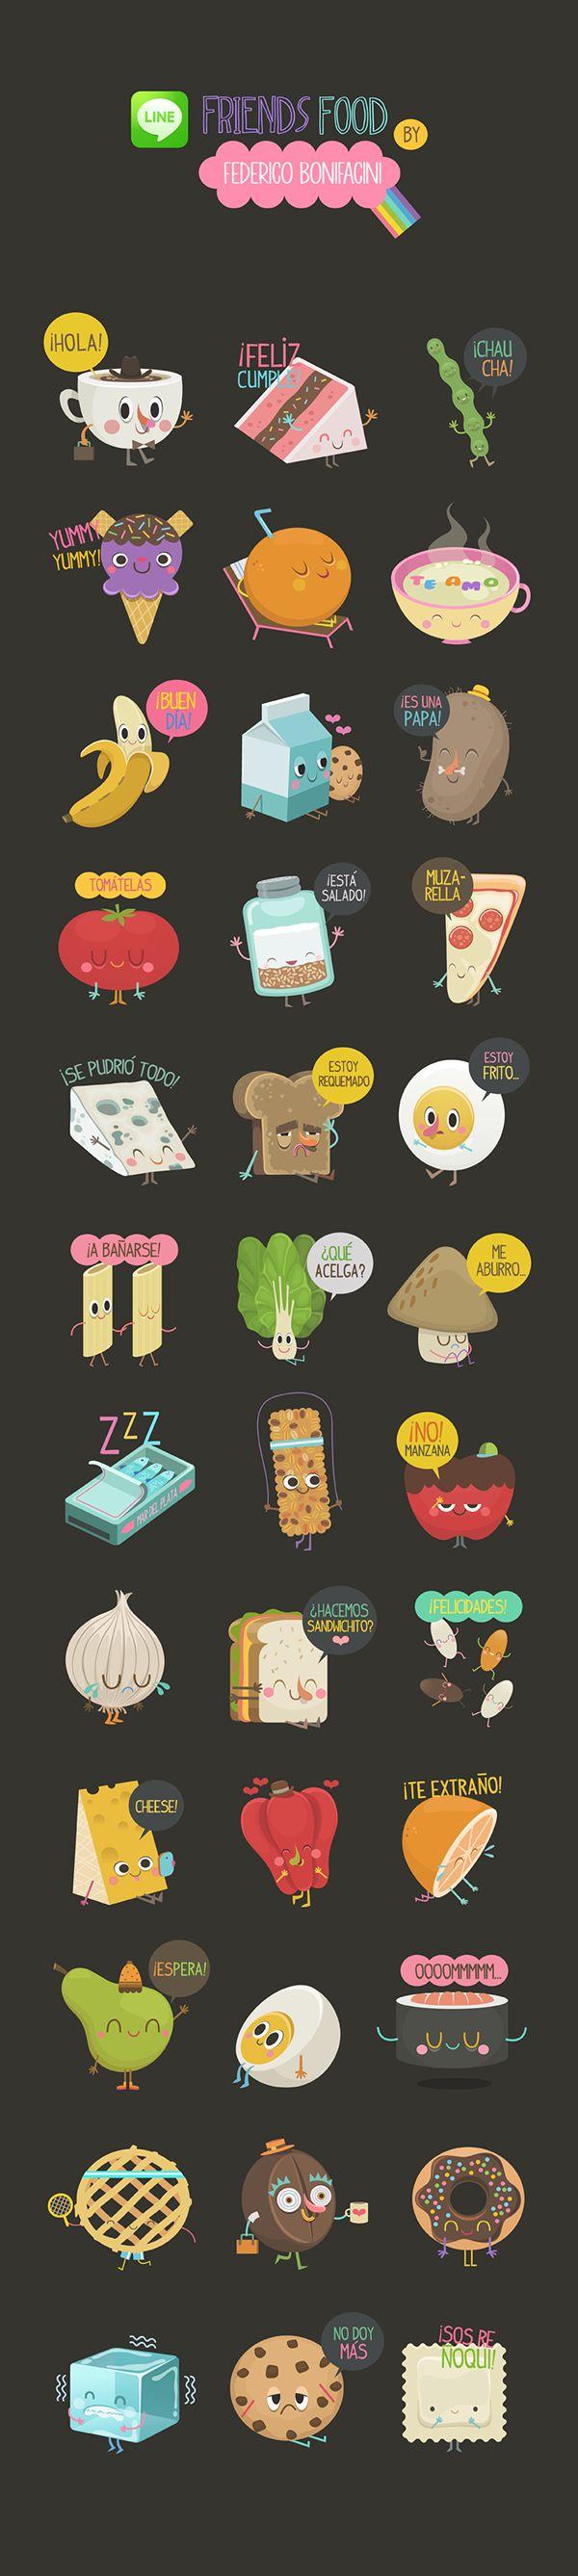 FRIENDS FOOD Line Stickers on Behance by Federico Bonifacini